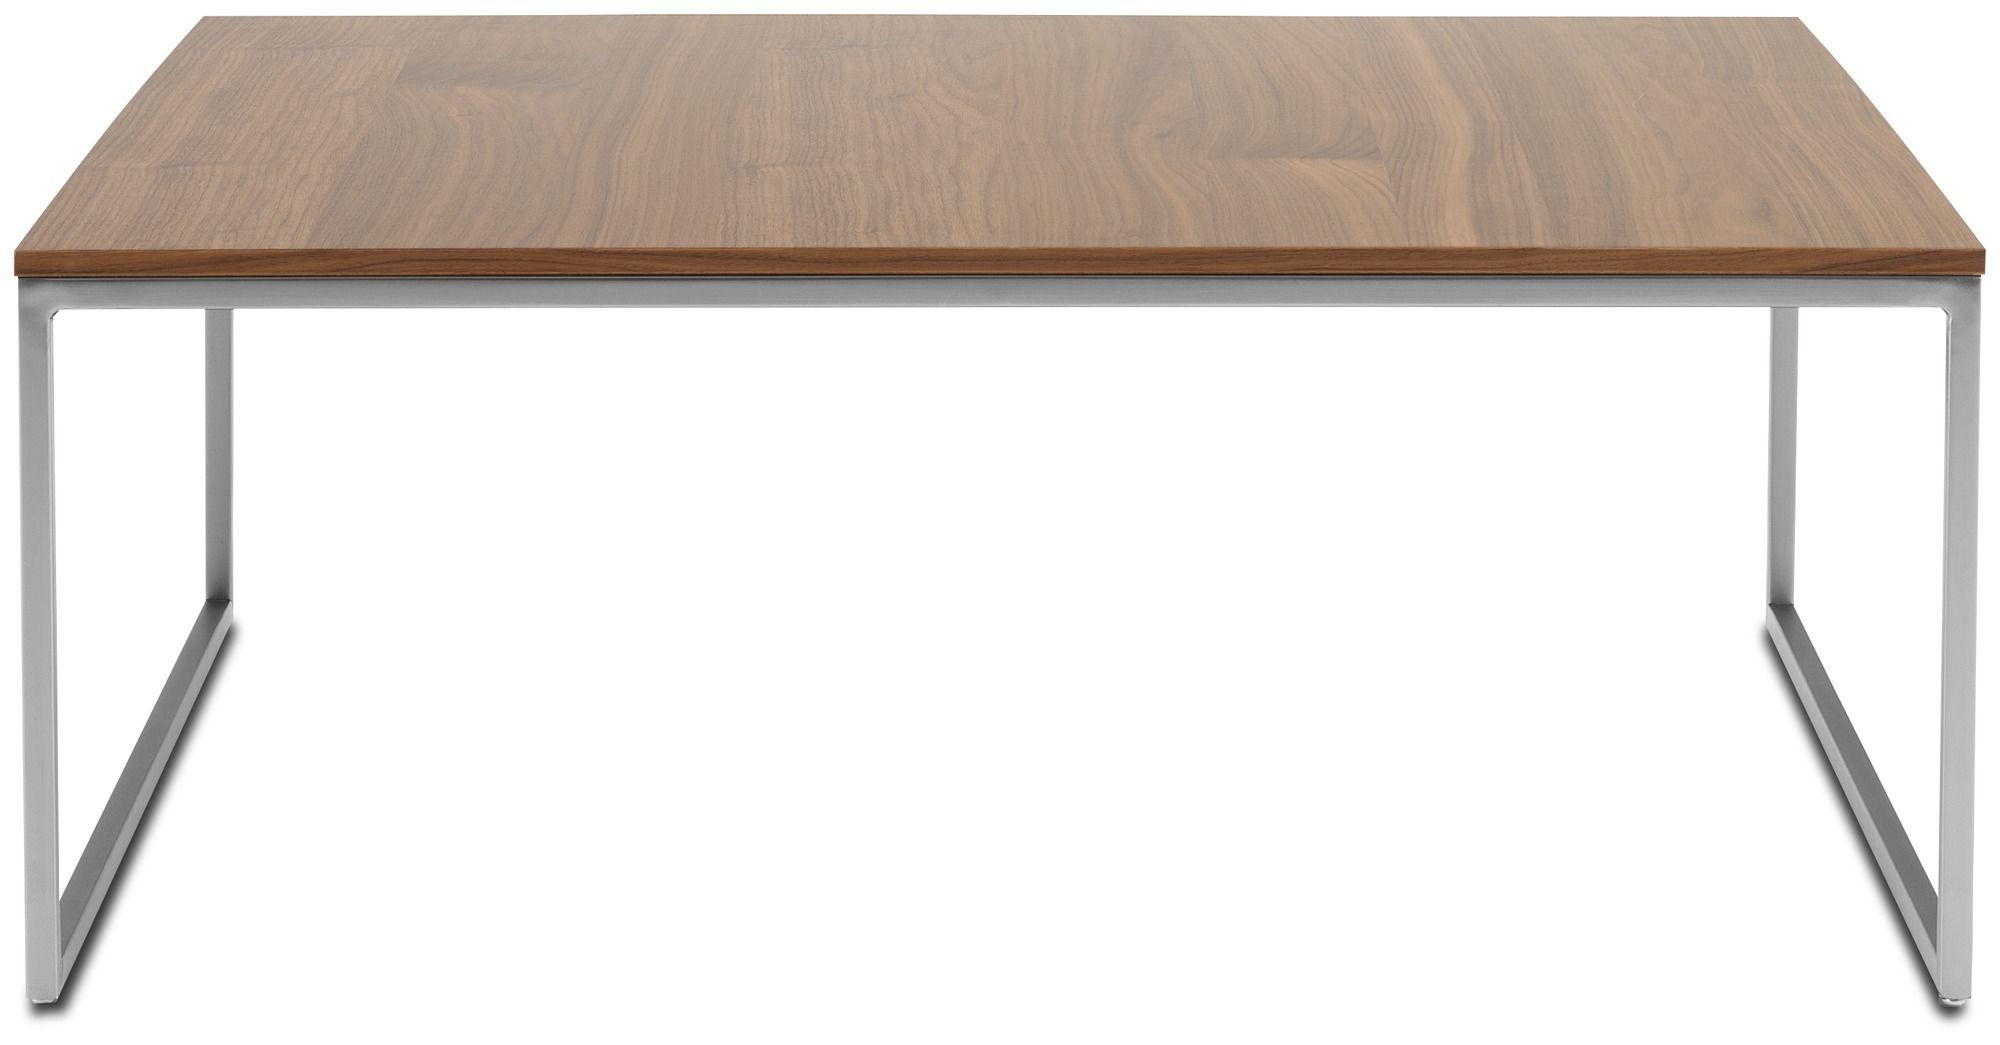 tables basses design pour votre salon boconcept furniture for the pent pinterest. Black Bedroom Furniture Sets. Home Design Ideas